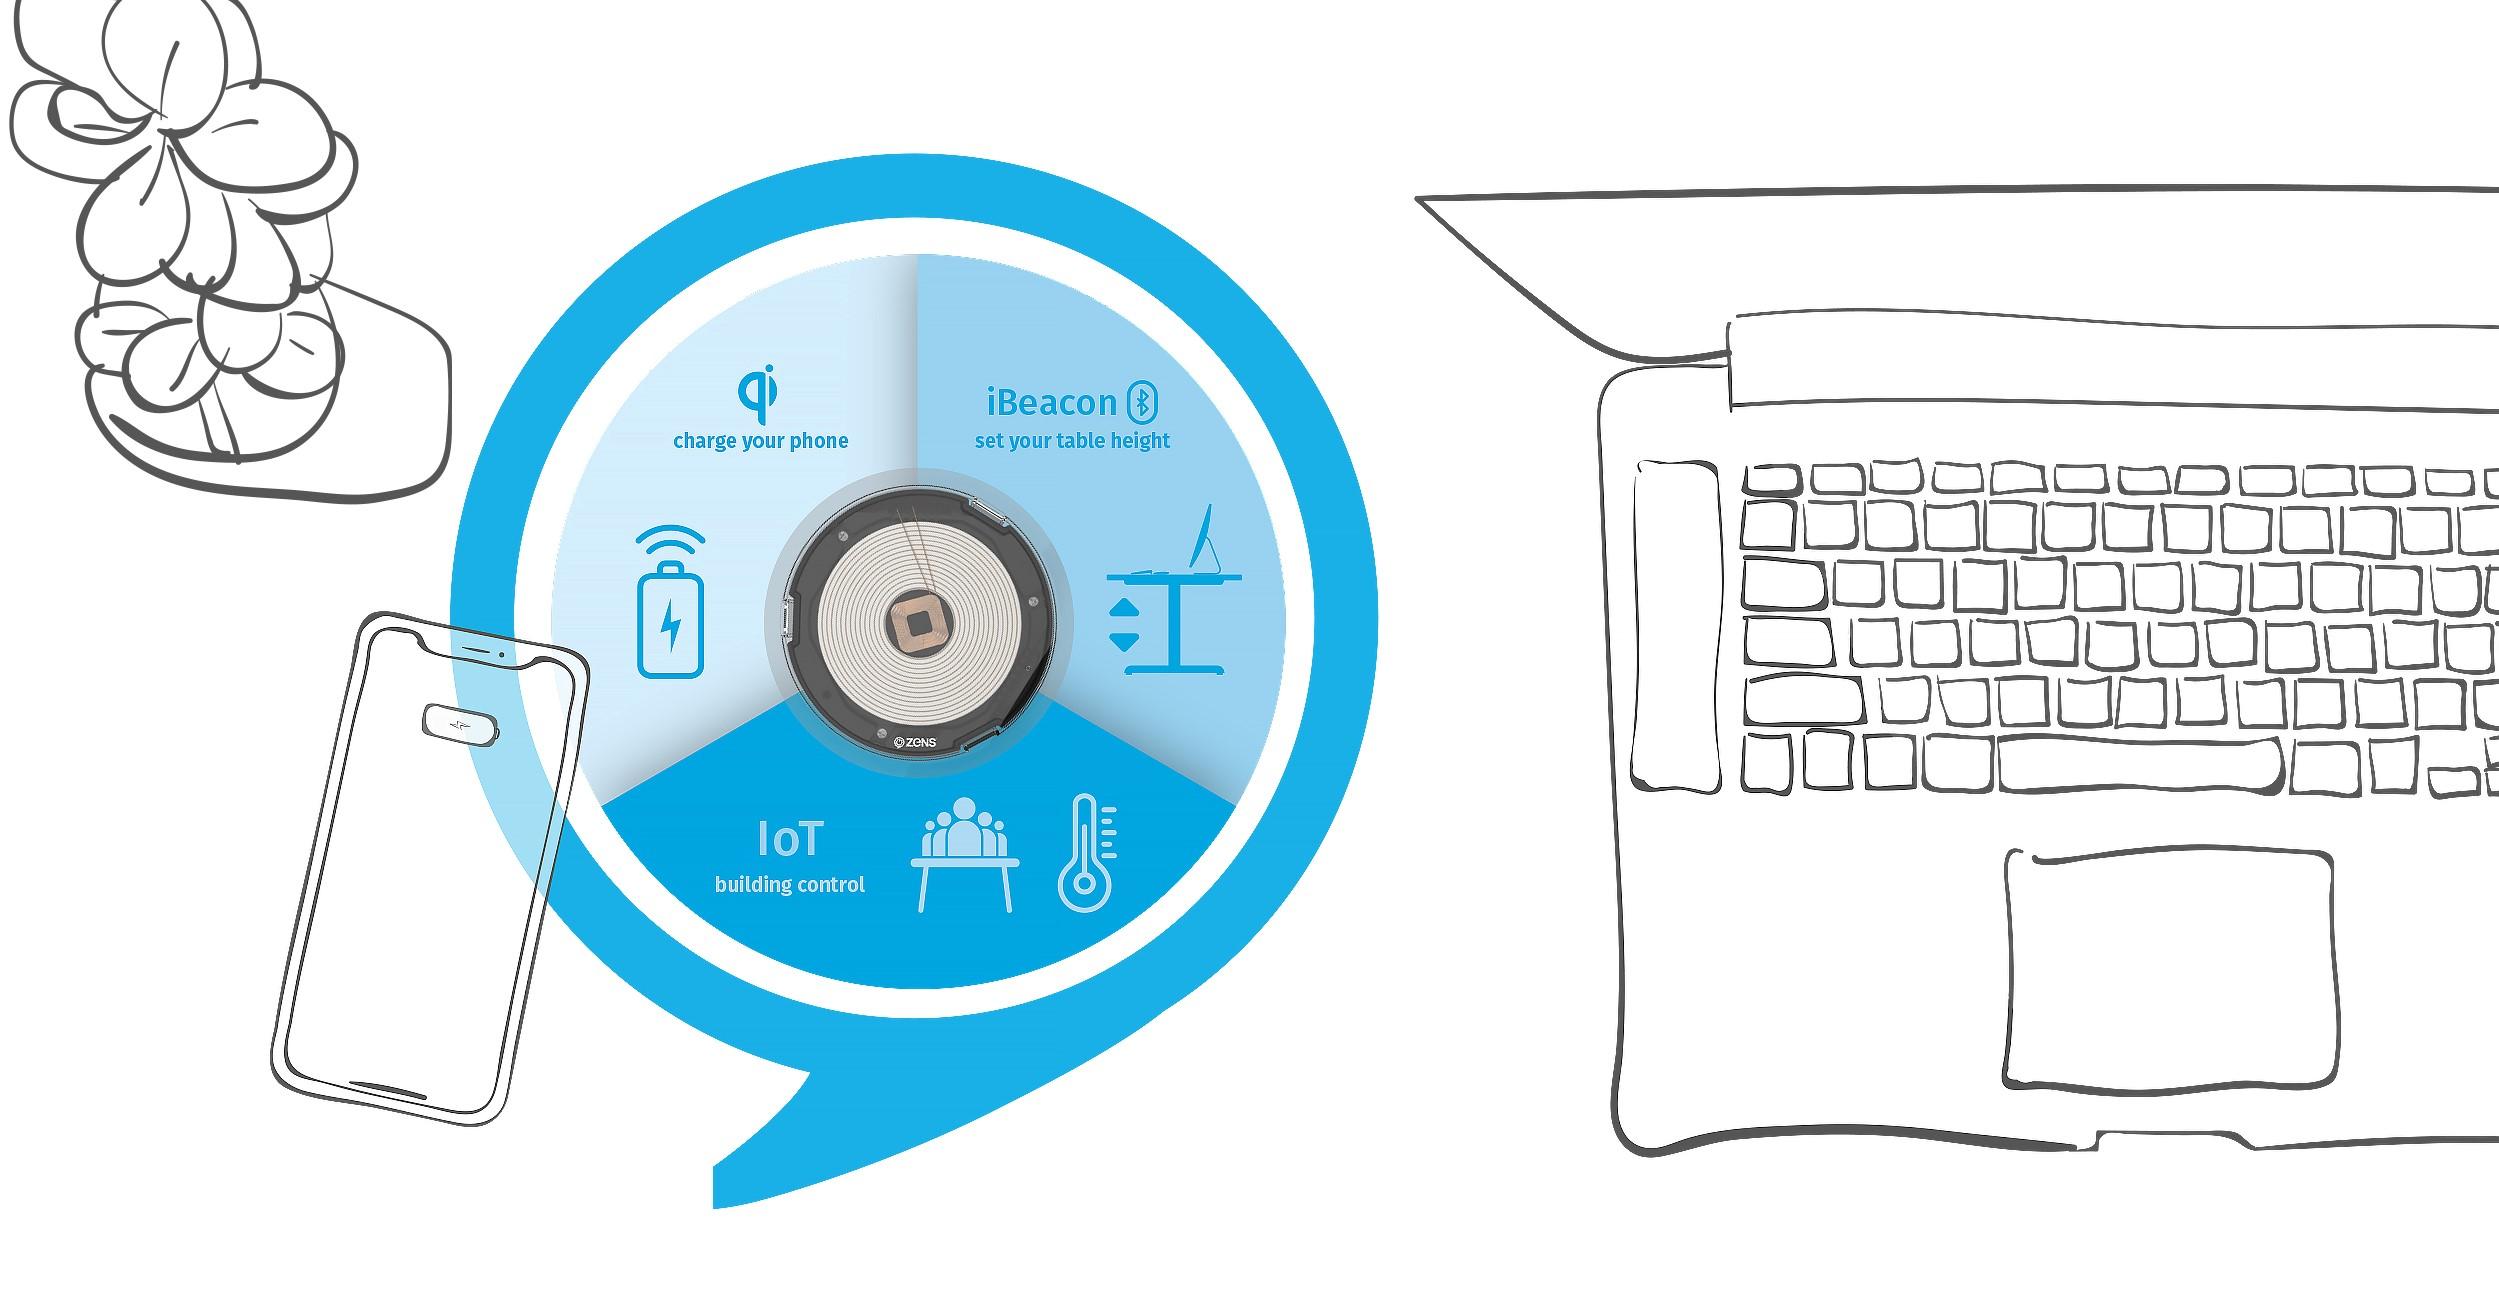 Orgatec 2018 ZENS Intelligent Wireless Charging